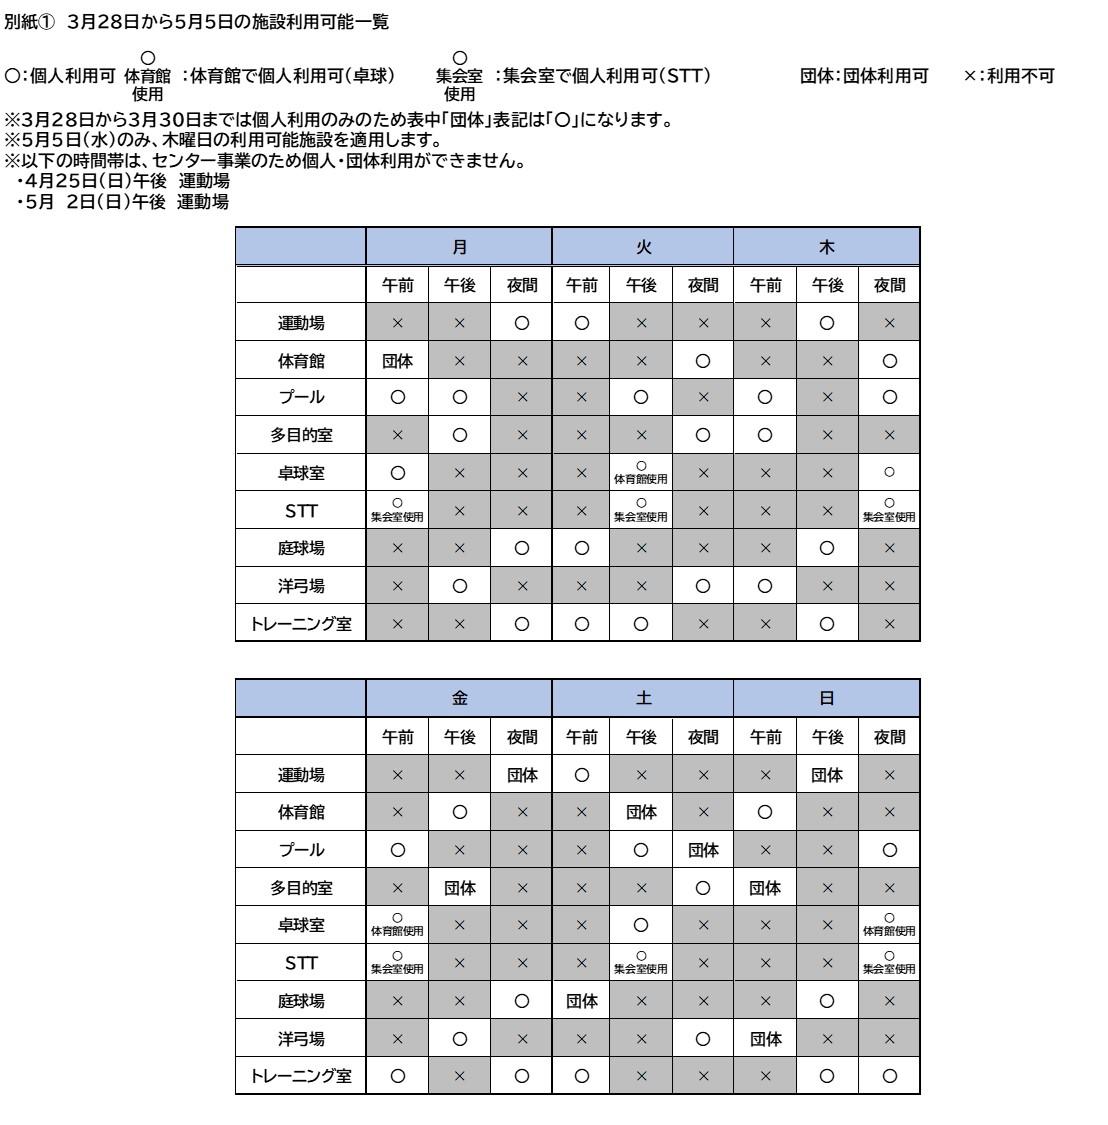 2e9647c124cdd78bf999646fea858984 1 - 【3月28日~】【個人利用】新型コロナウィルス感染症対策に伴う施設利用について